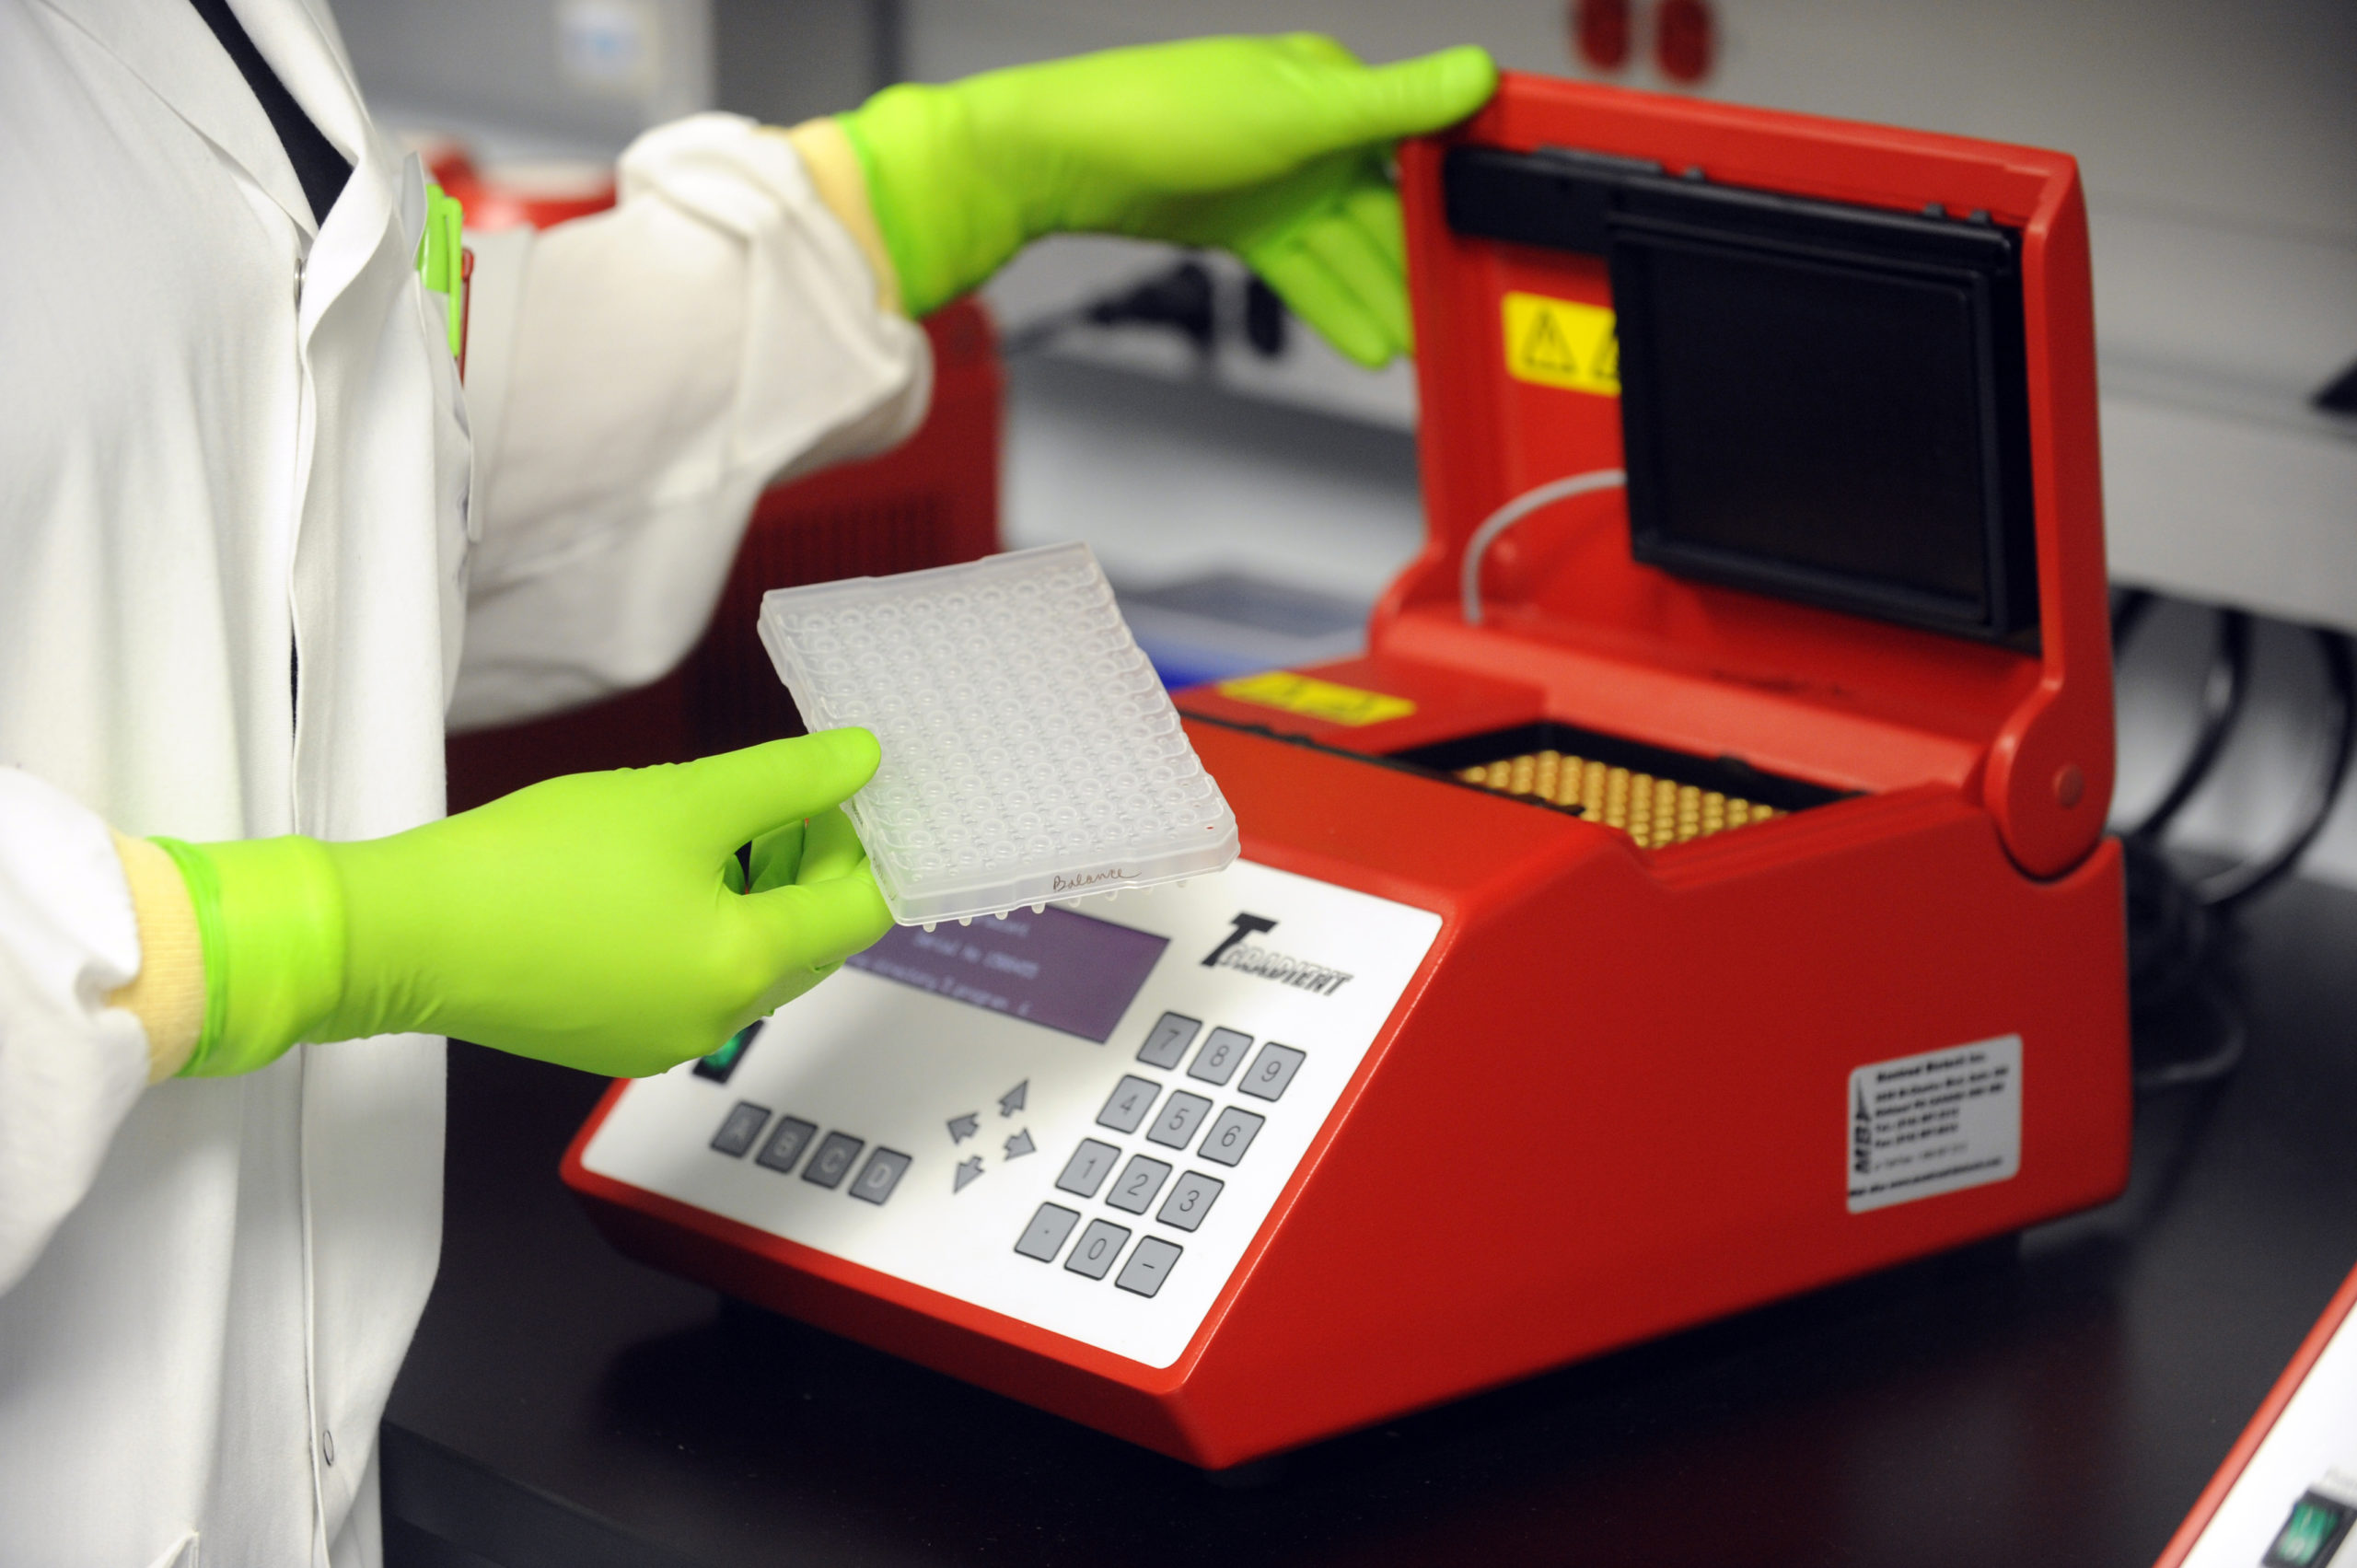 Medical testing machine